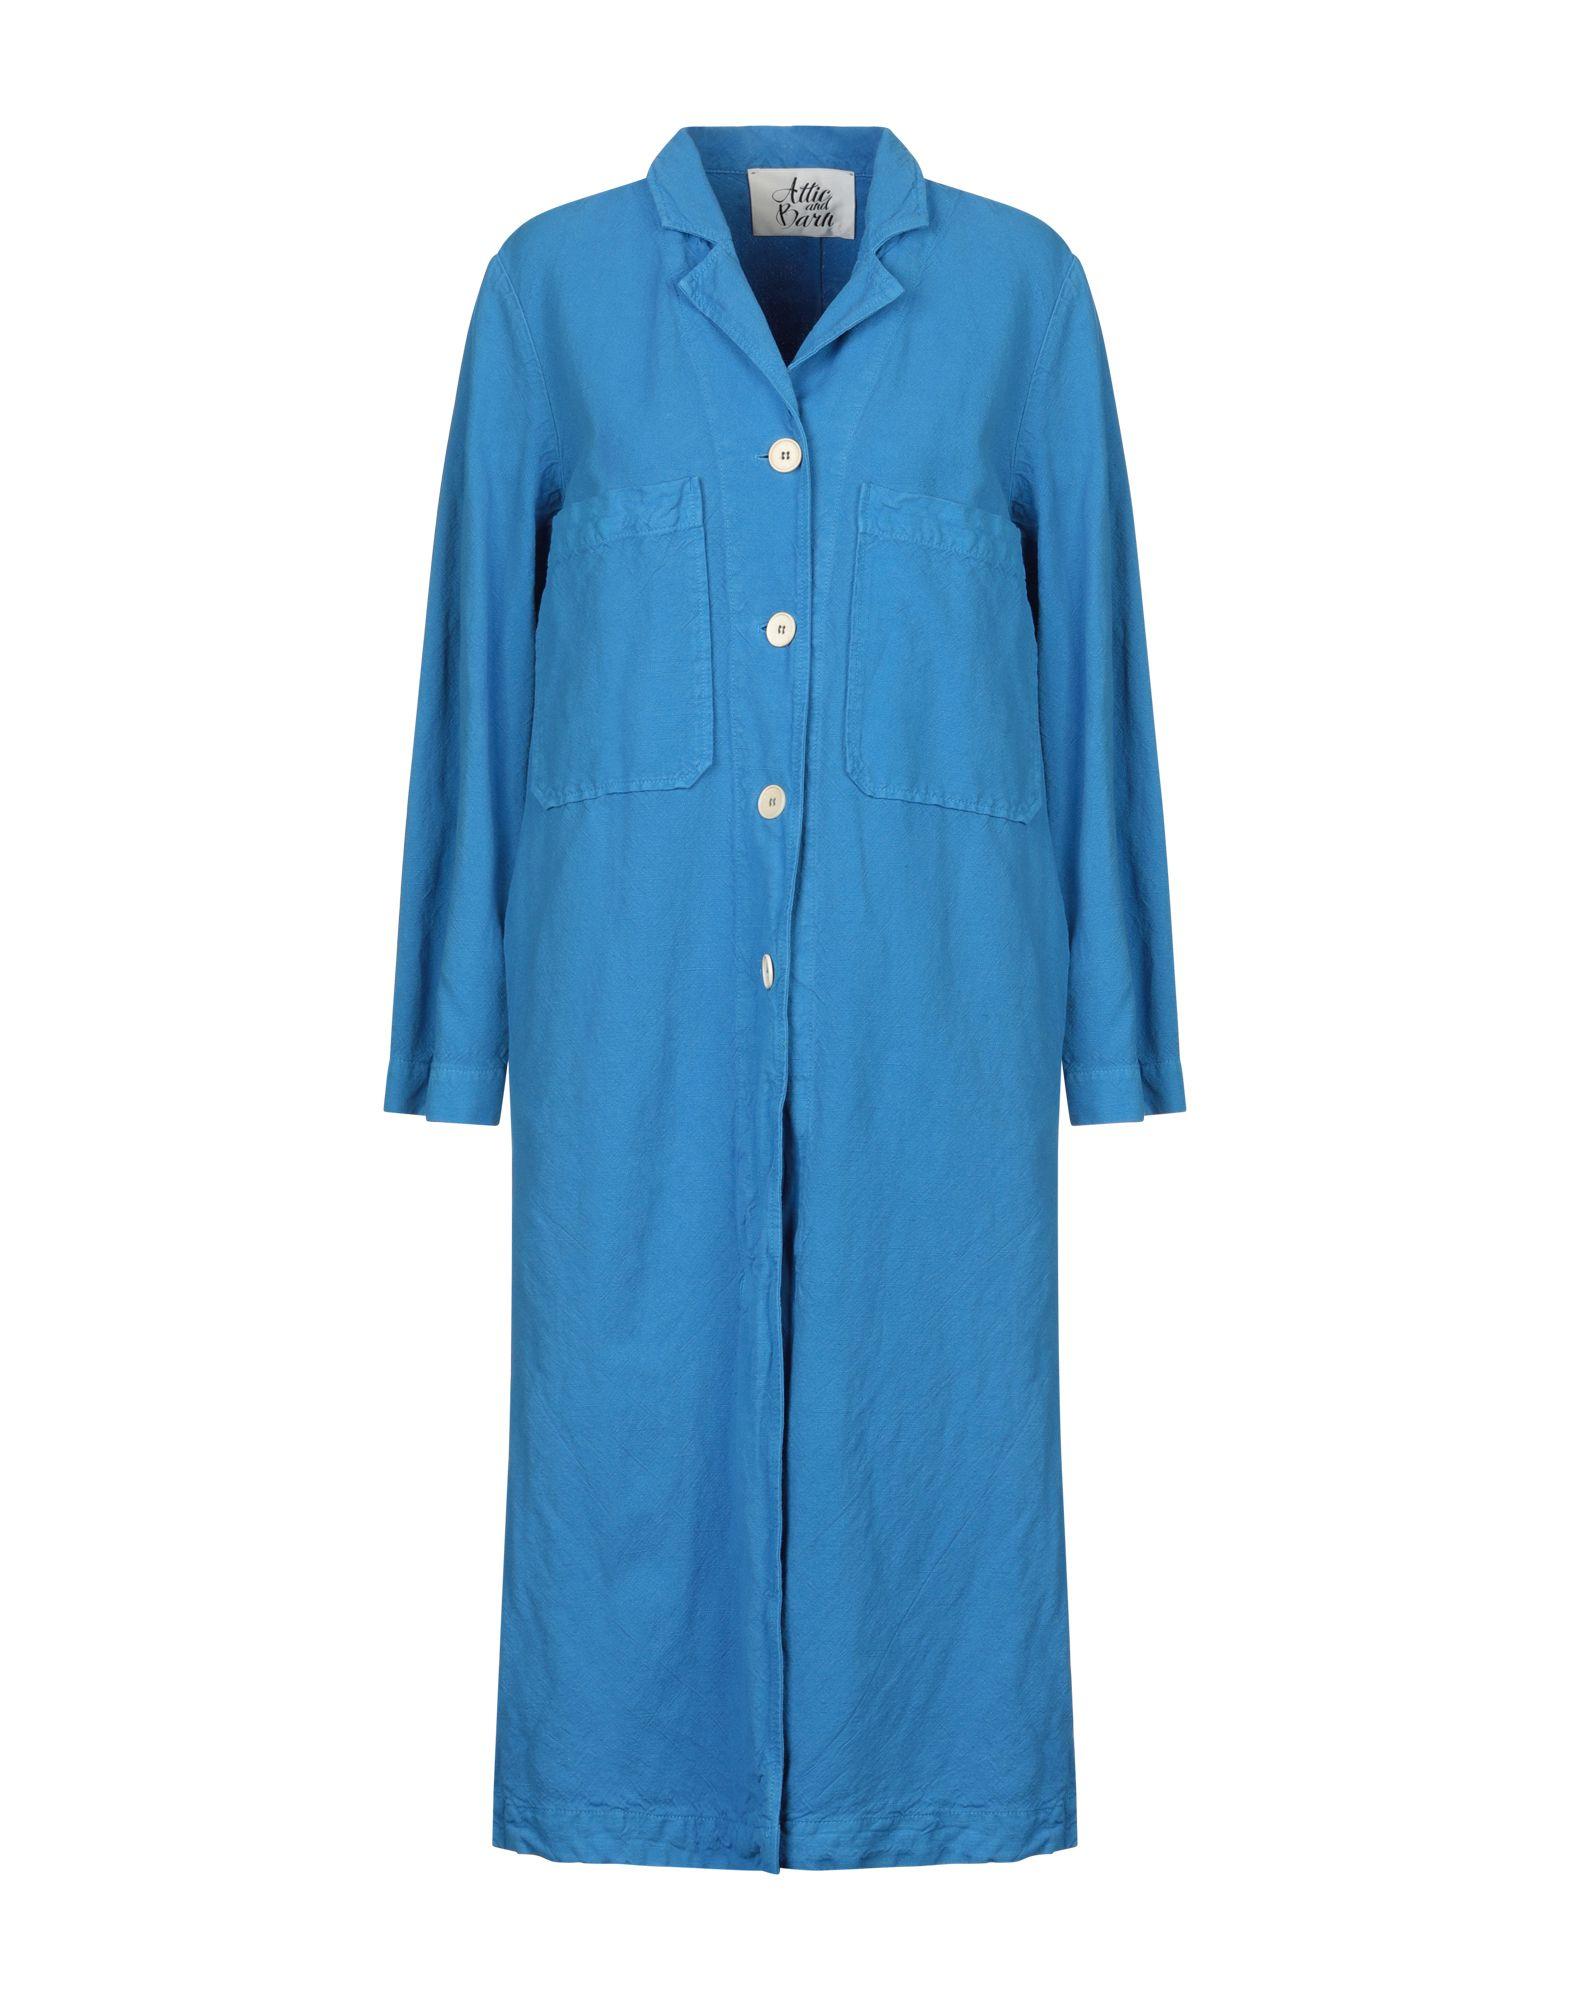 ATTIC AND BARN Легкое пальто silk and soie легкое пальто